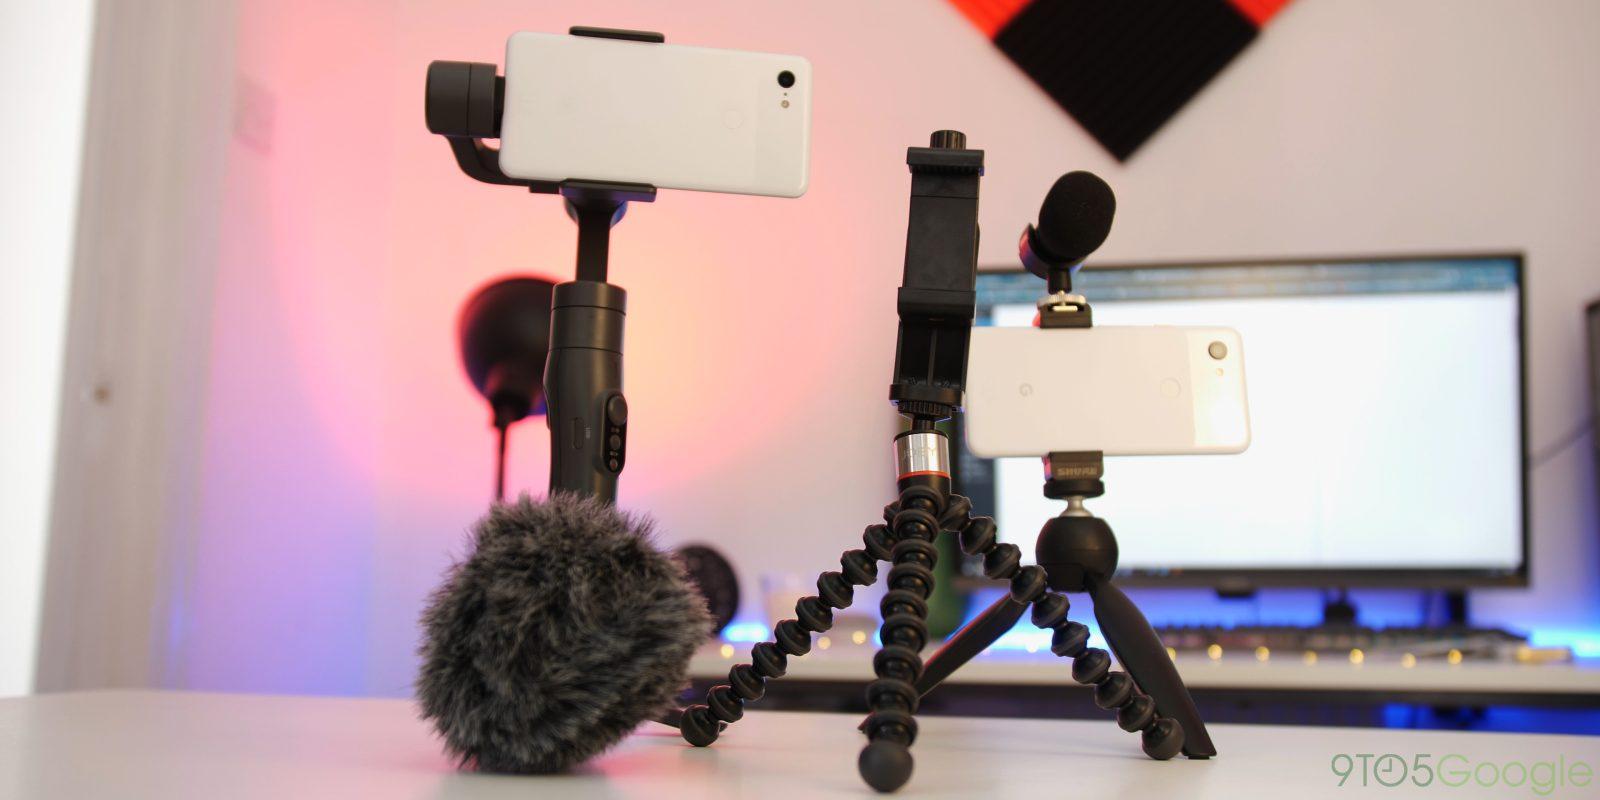 Pixel 3 starter kit: Ultimate video-making gear [Video] - 9to5Google